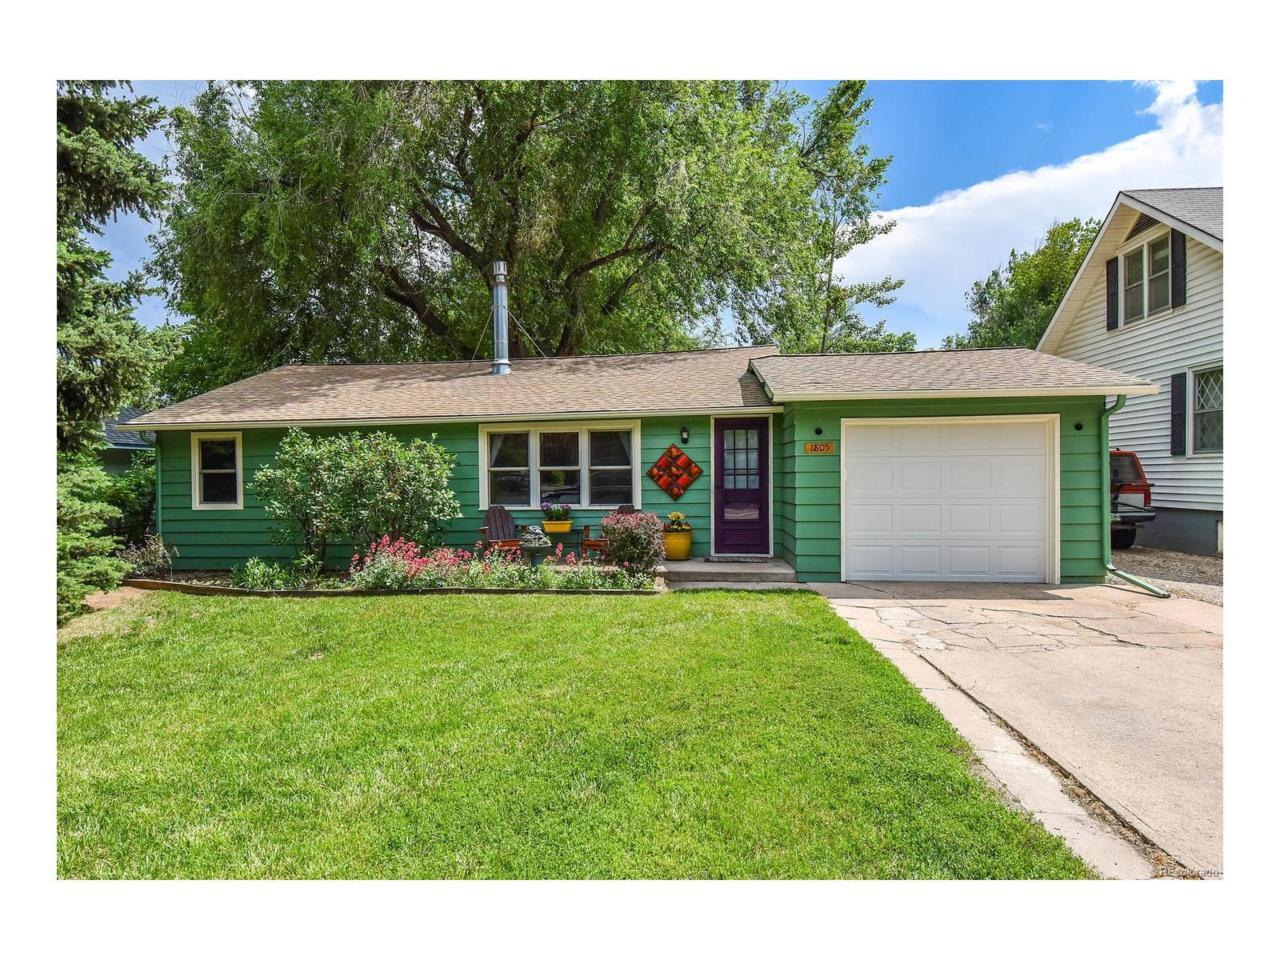 1805 Laporte Avenue, Fort Collins, CO 80521 (MLS #2167085) :: 8z Real Estate